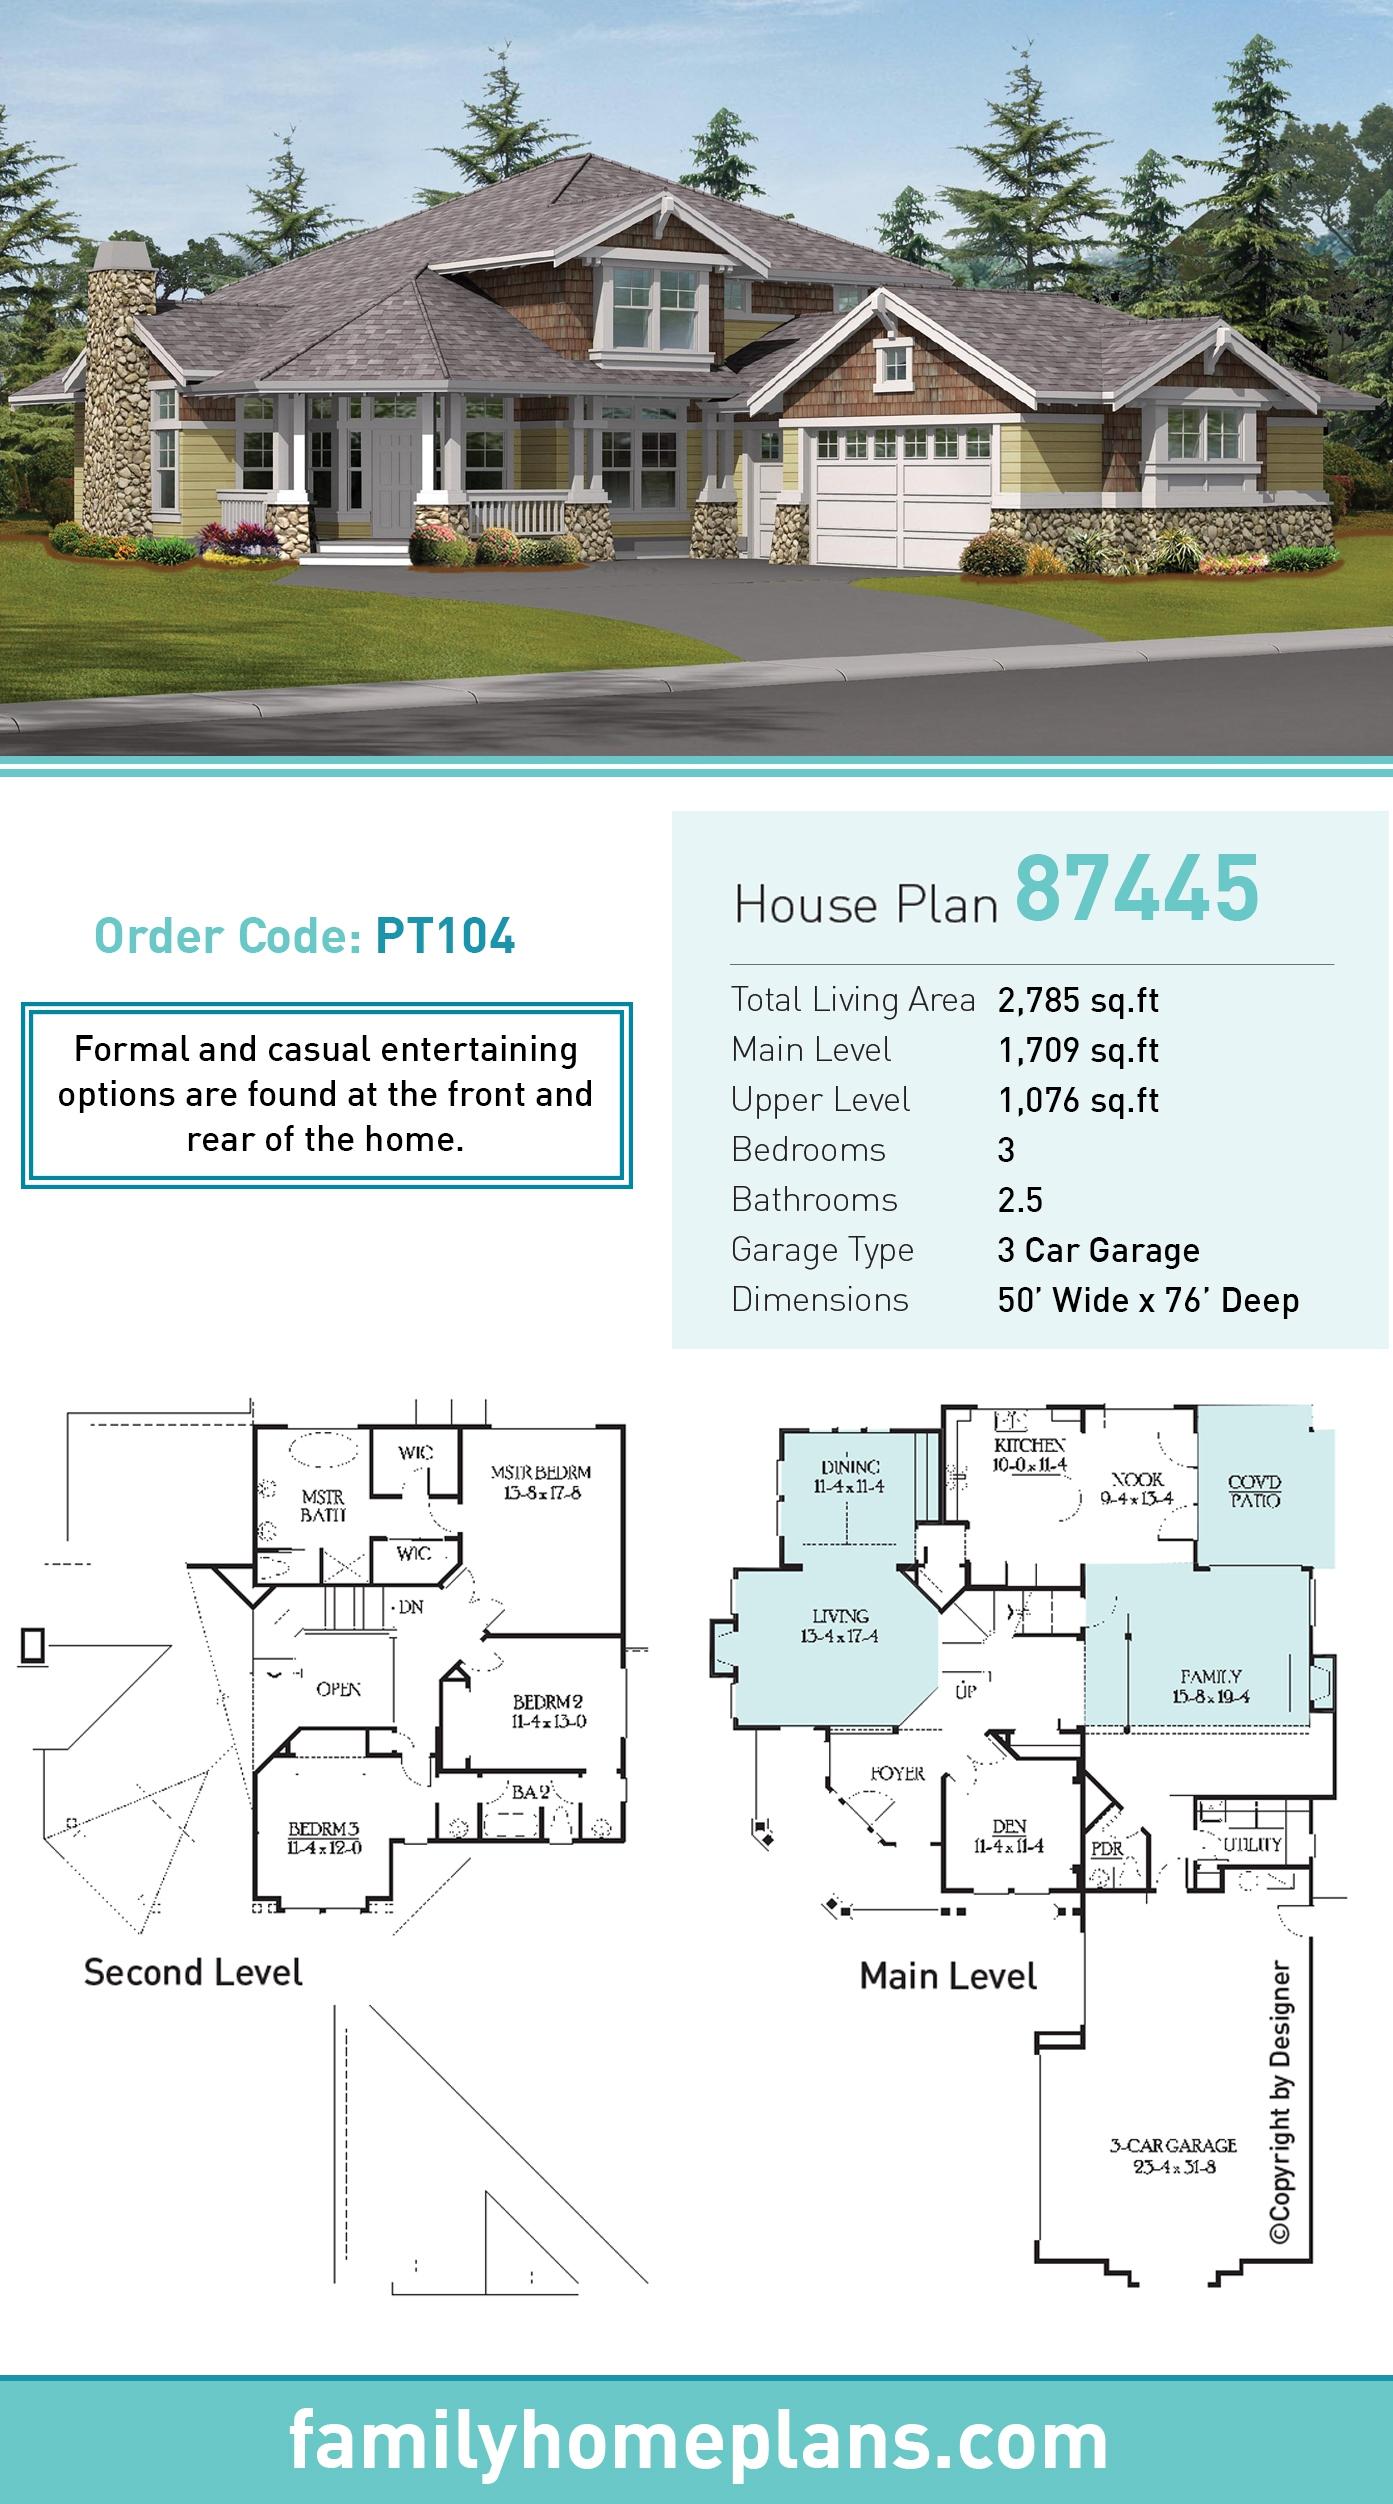 Craftsman House Plan 87445 with 3 Beds, 3 Baths, 3 Car Garage